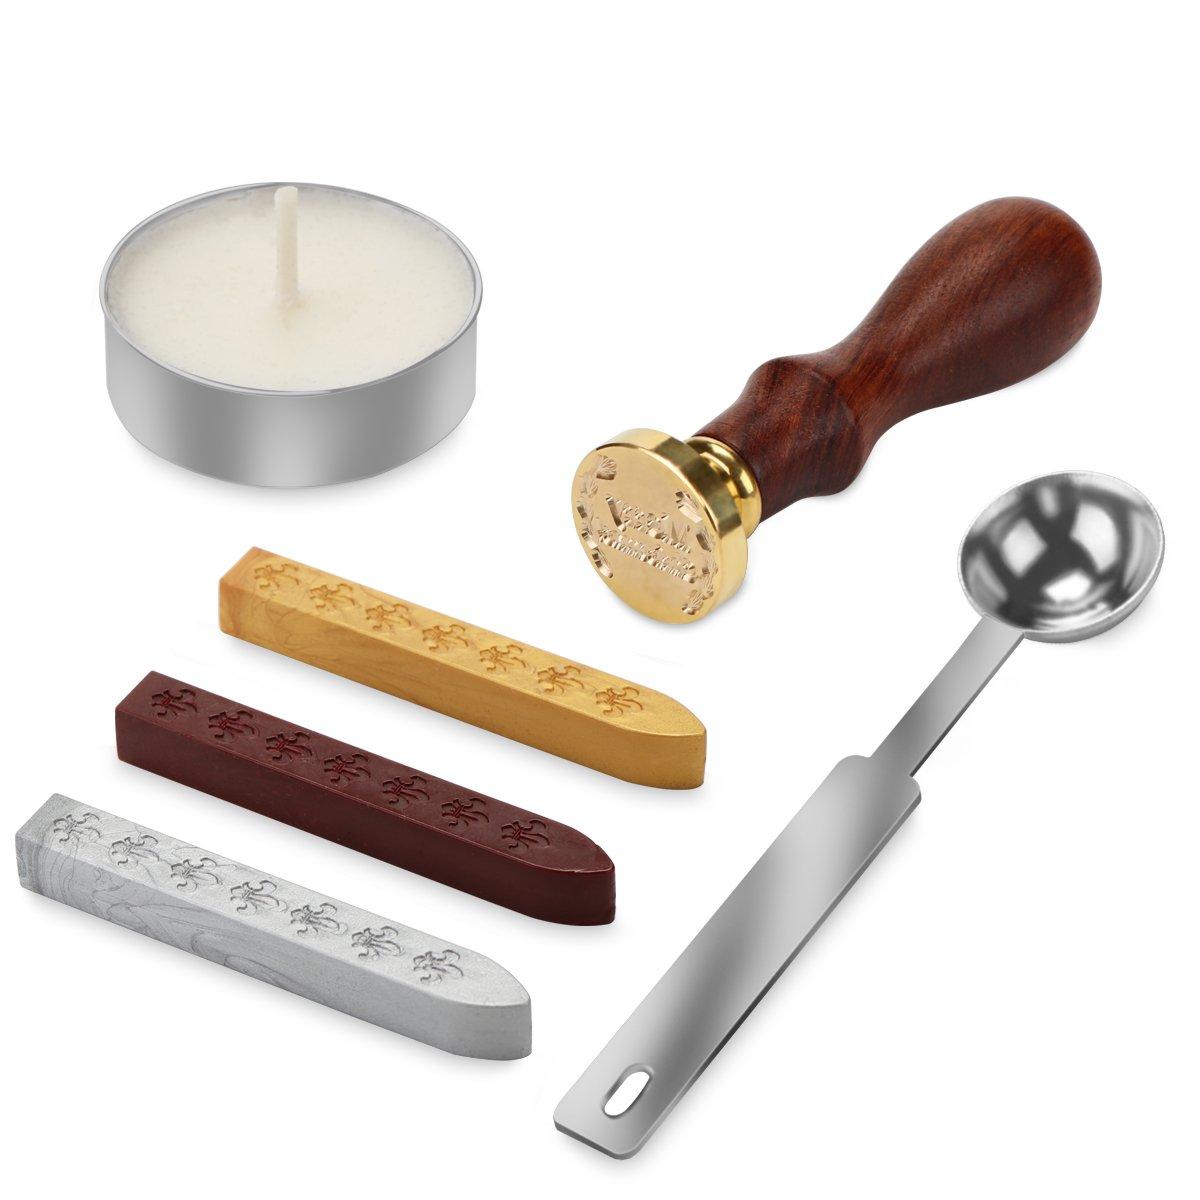 TiooDre Retro Christmas Wax Seal Stamp Kit Wax Stick Spoon Gift Box Set